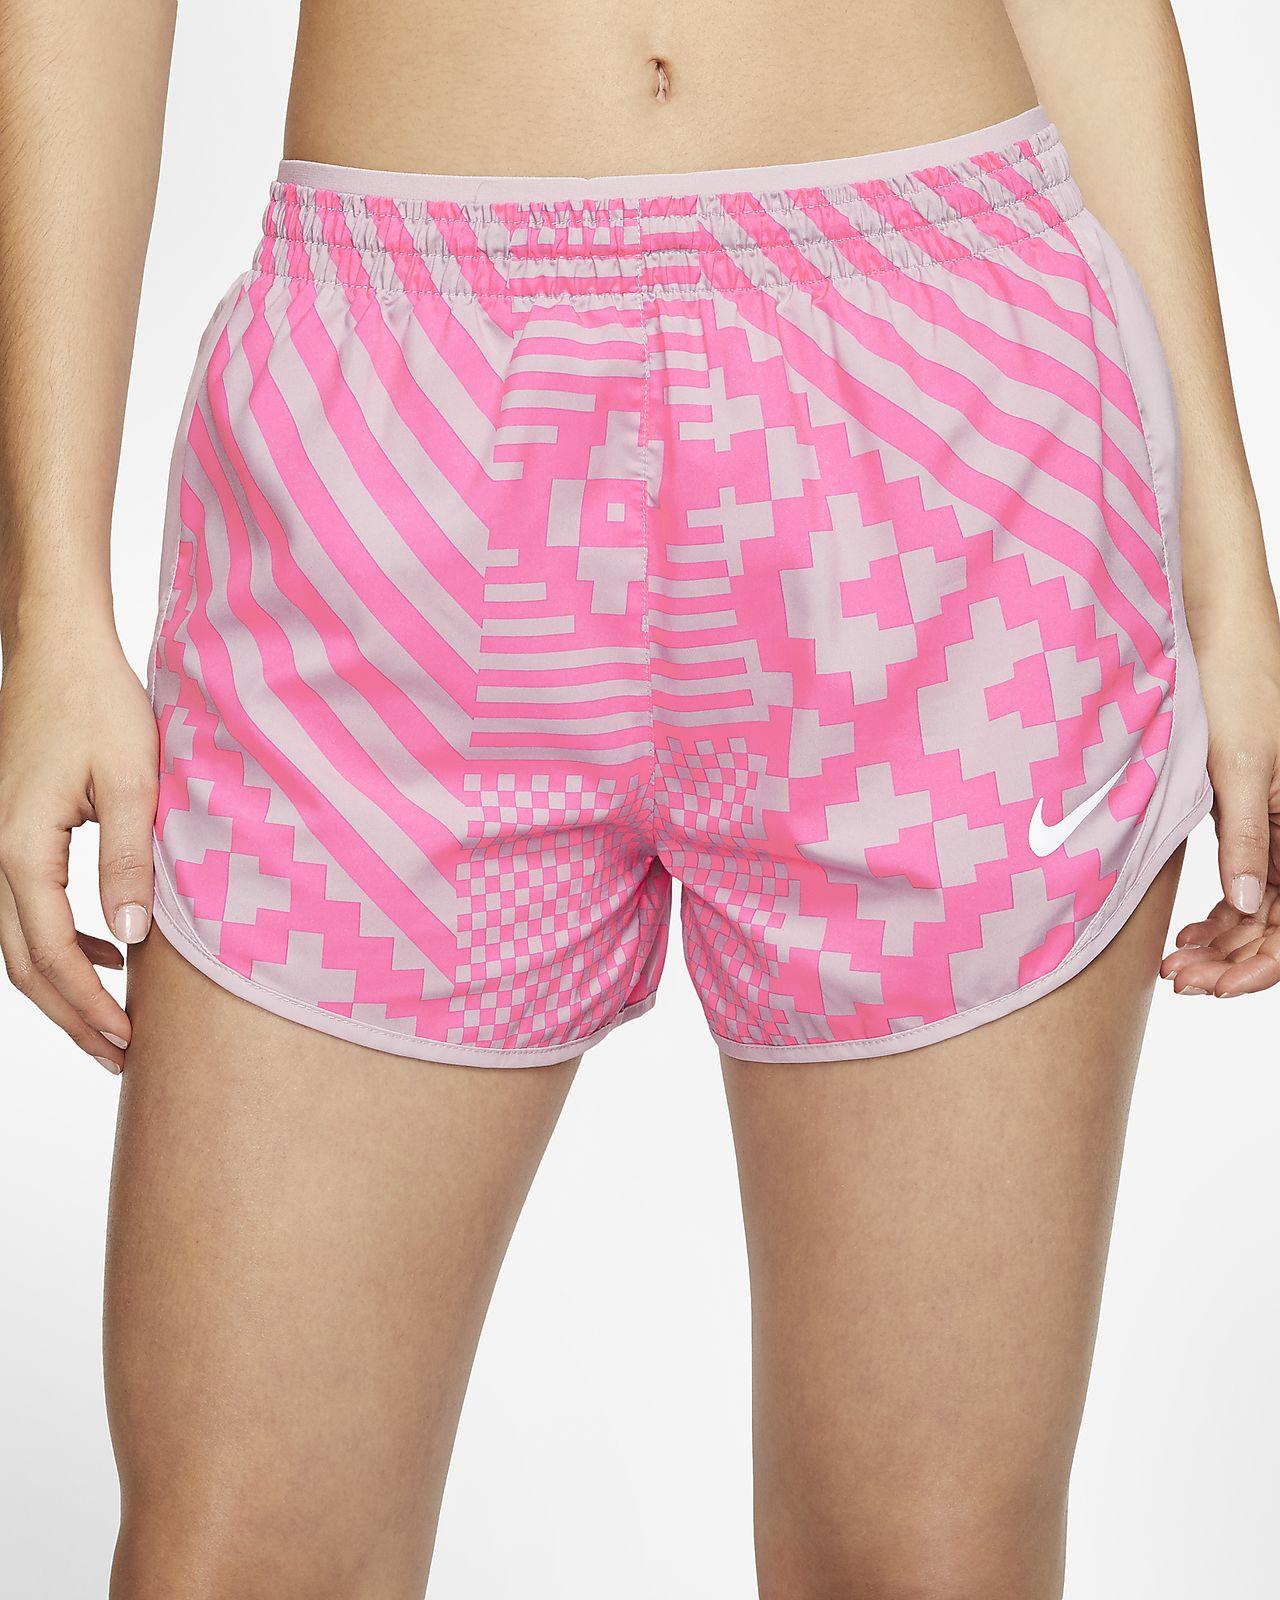 Nike Tempo Lux Women's Running Shorts